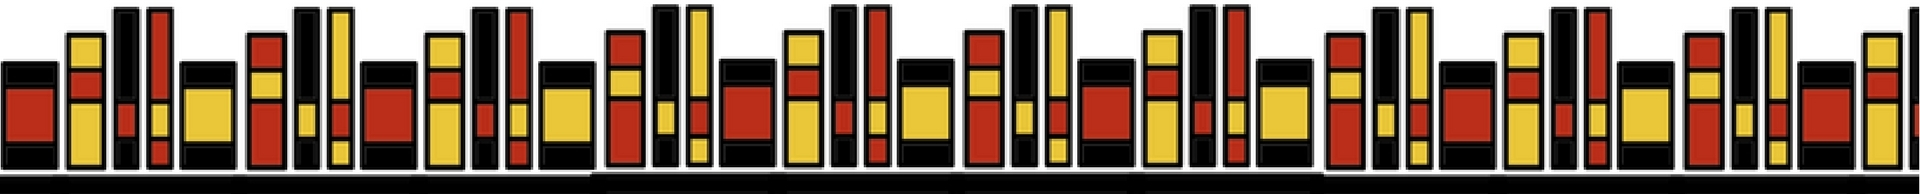 RockTownReads Section Divider.jpg